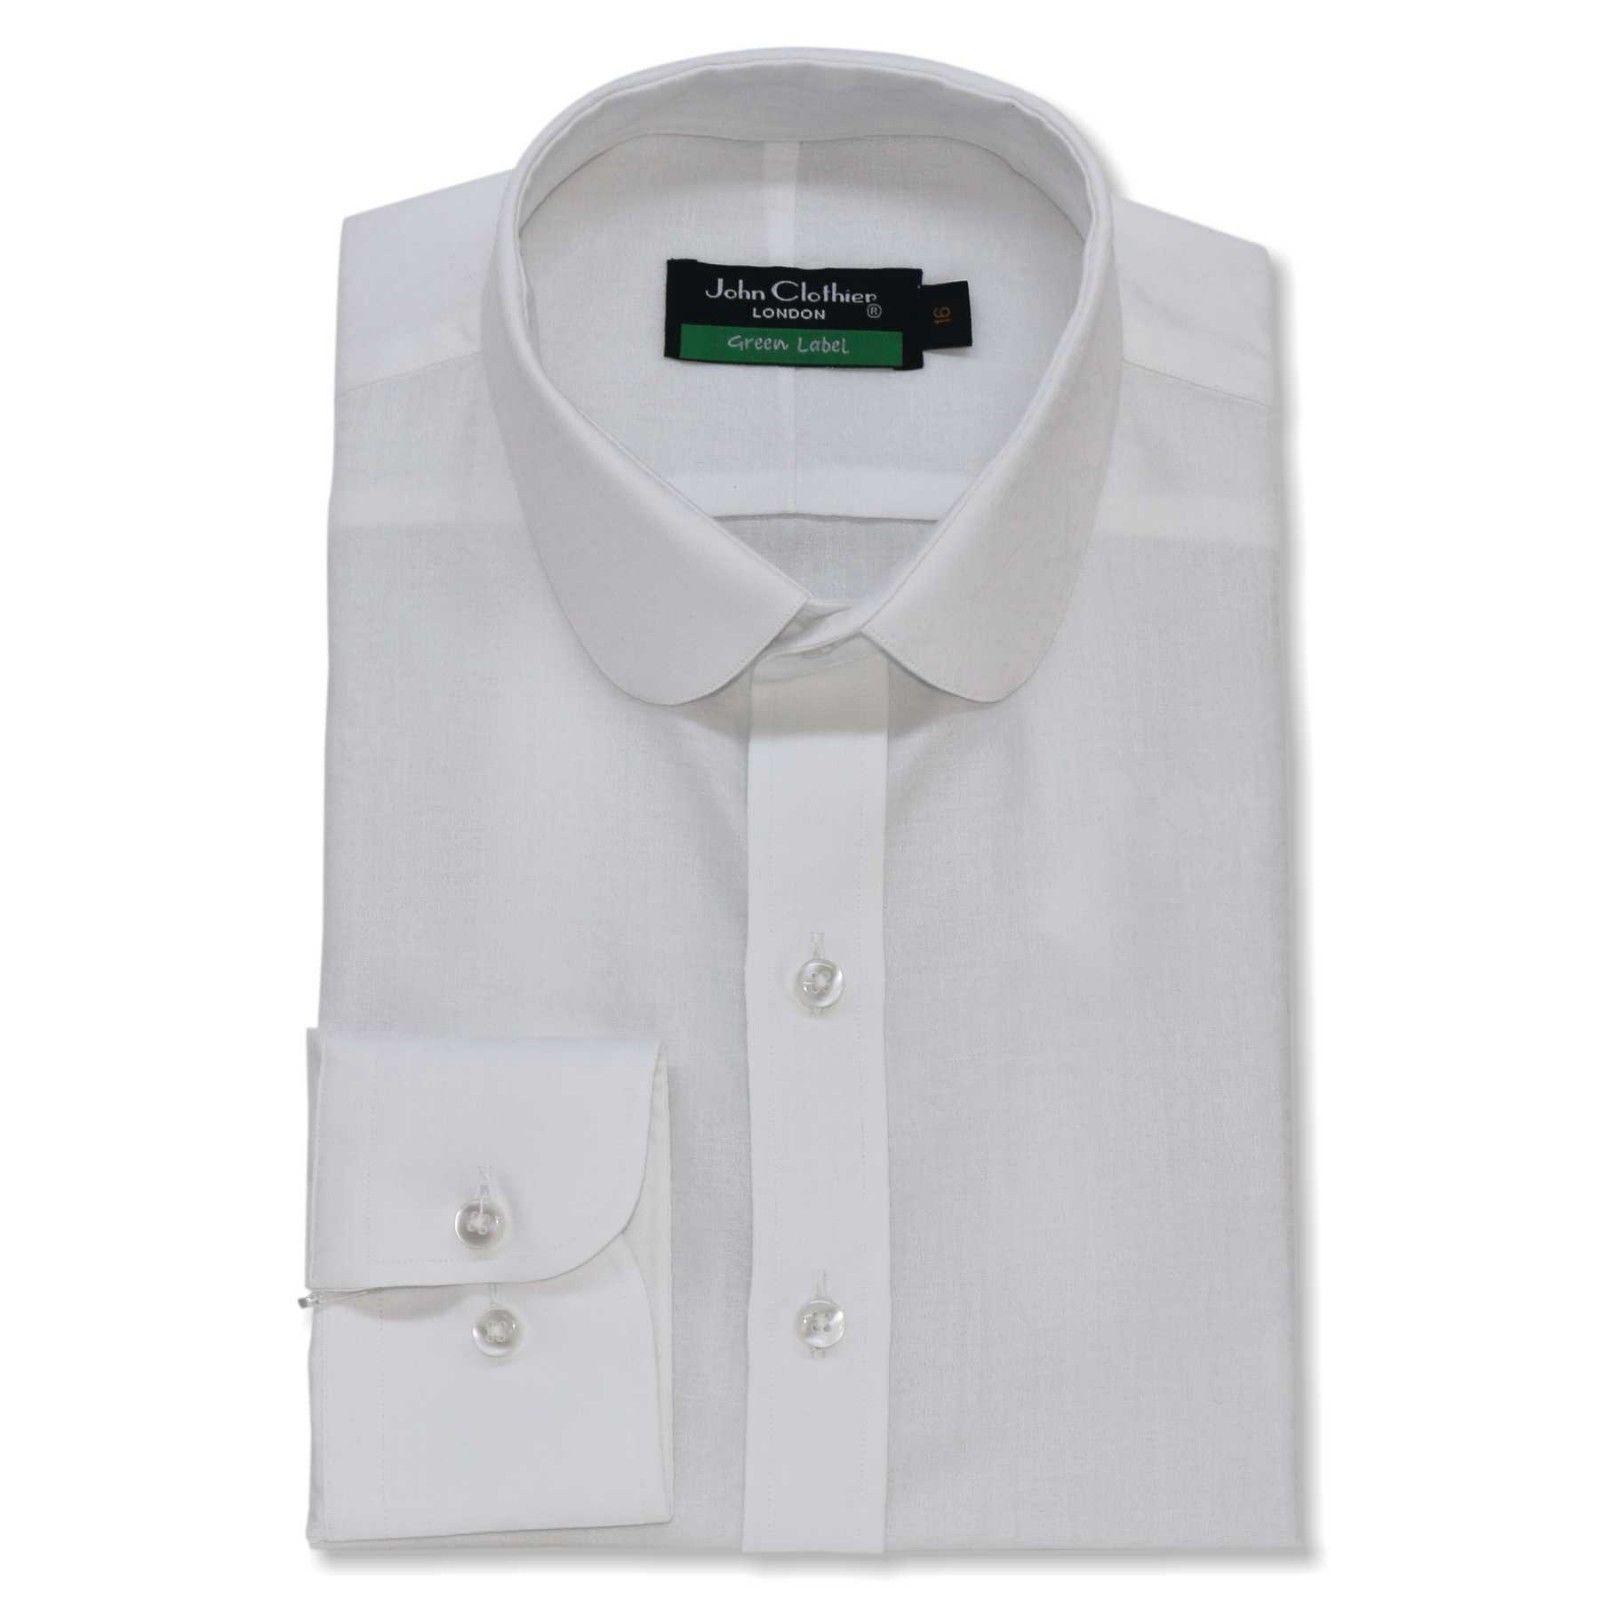 Peaky Blinders  Herren Penny collar Weiß floral jacquard shirt Round Grandad Round